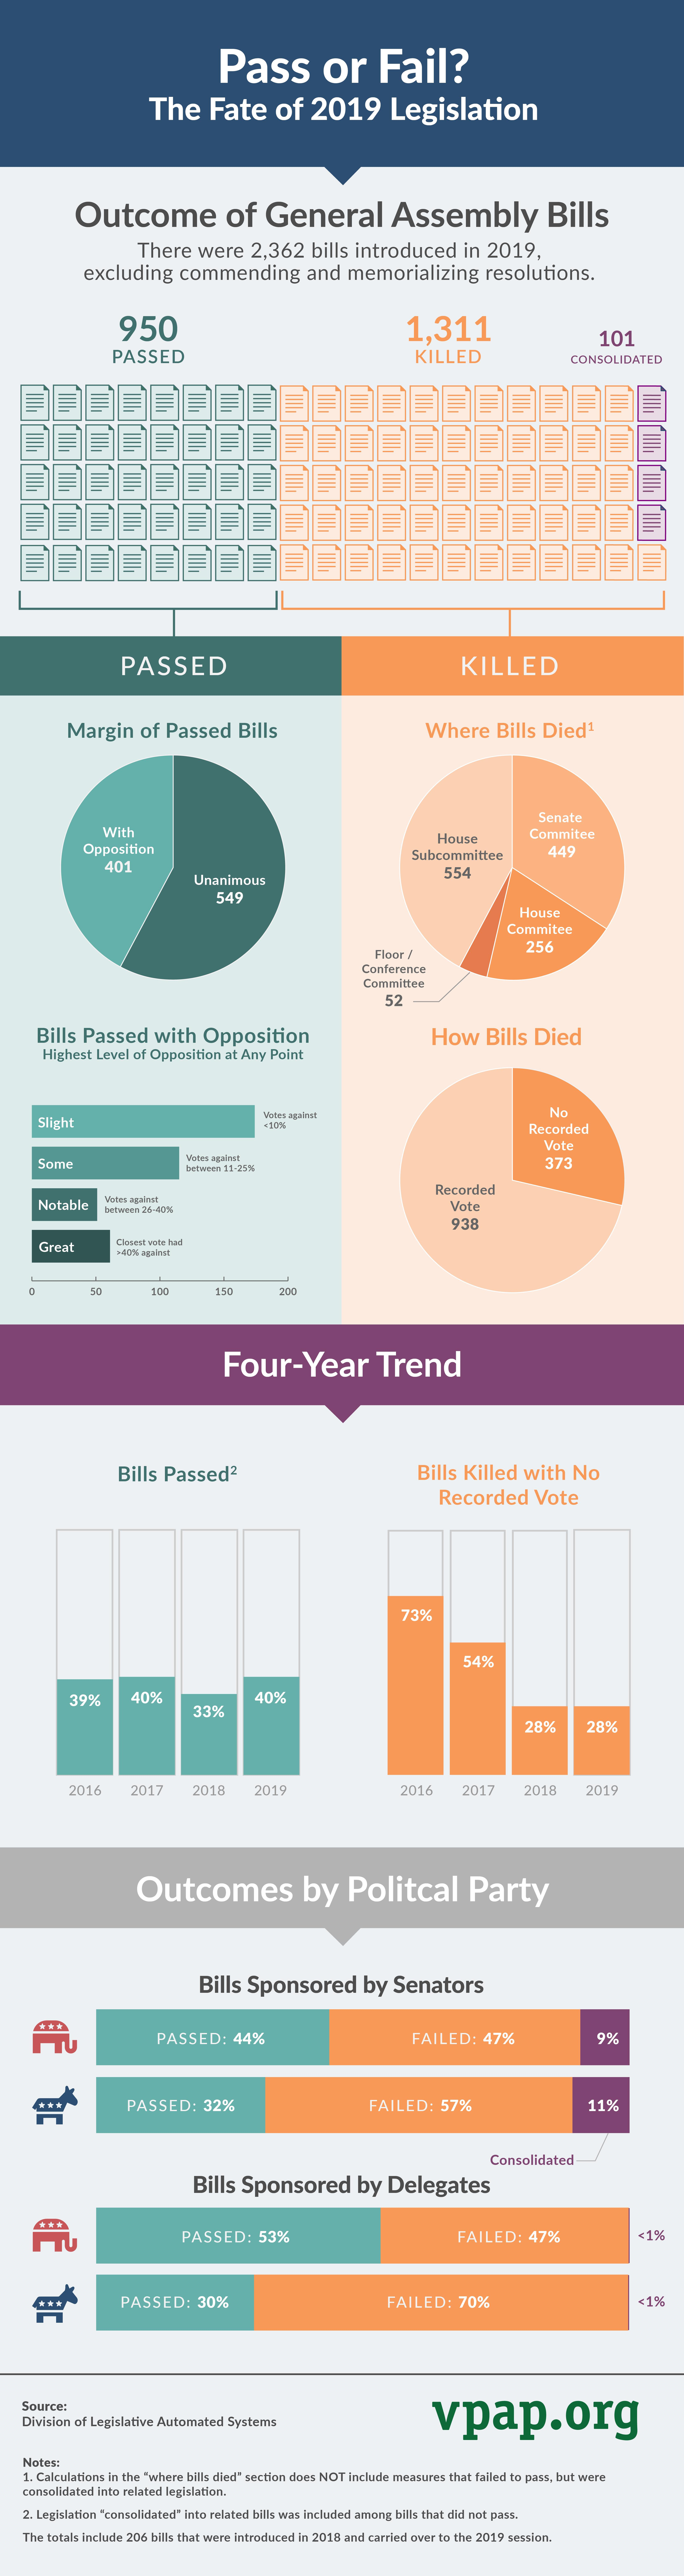 Fate of 2019 Legislation